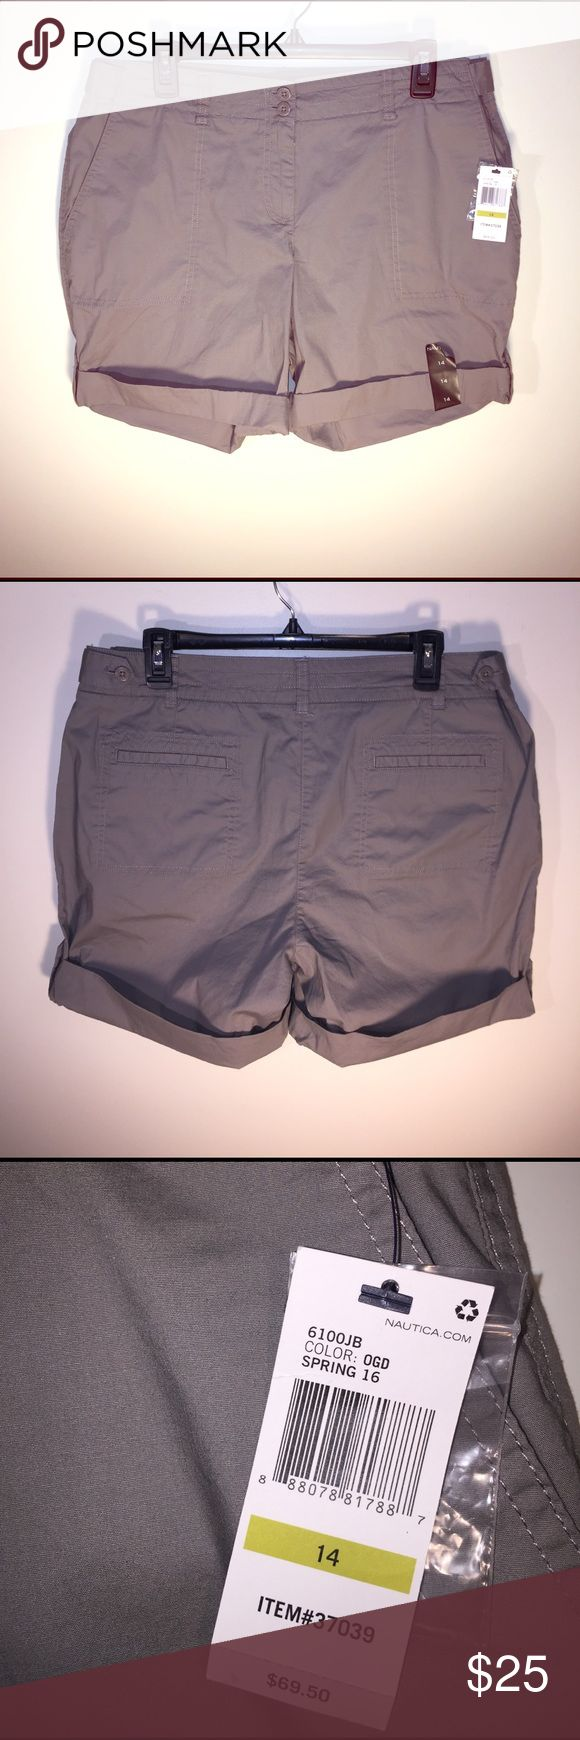 NEW Nautica Sz 14 Women's Grey Shorts NEW Nautica Sz 14 Women's Grey Shorts Lightweight Feel Nautica Shorts